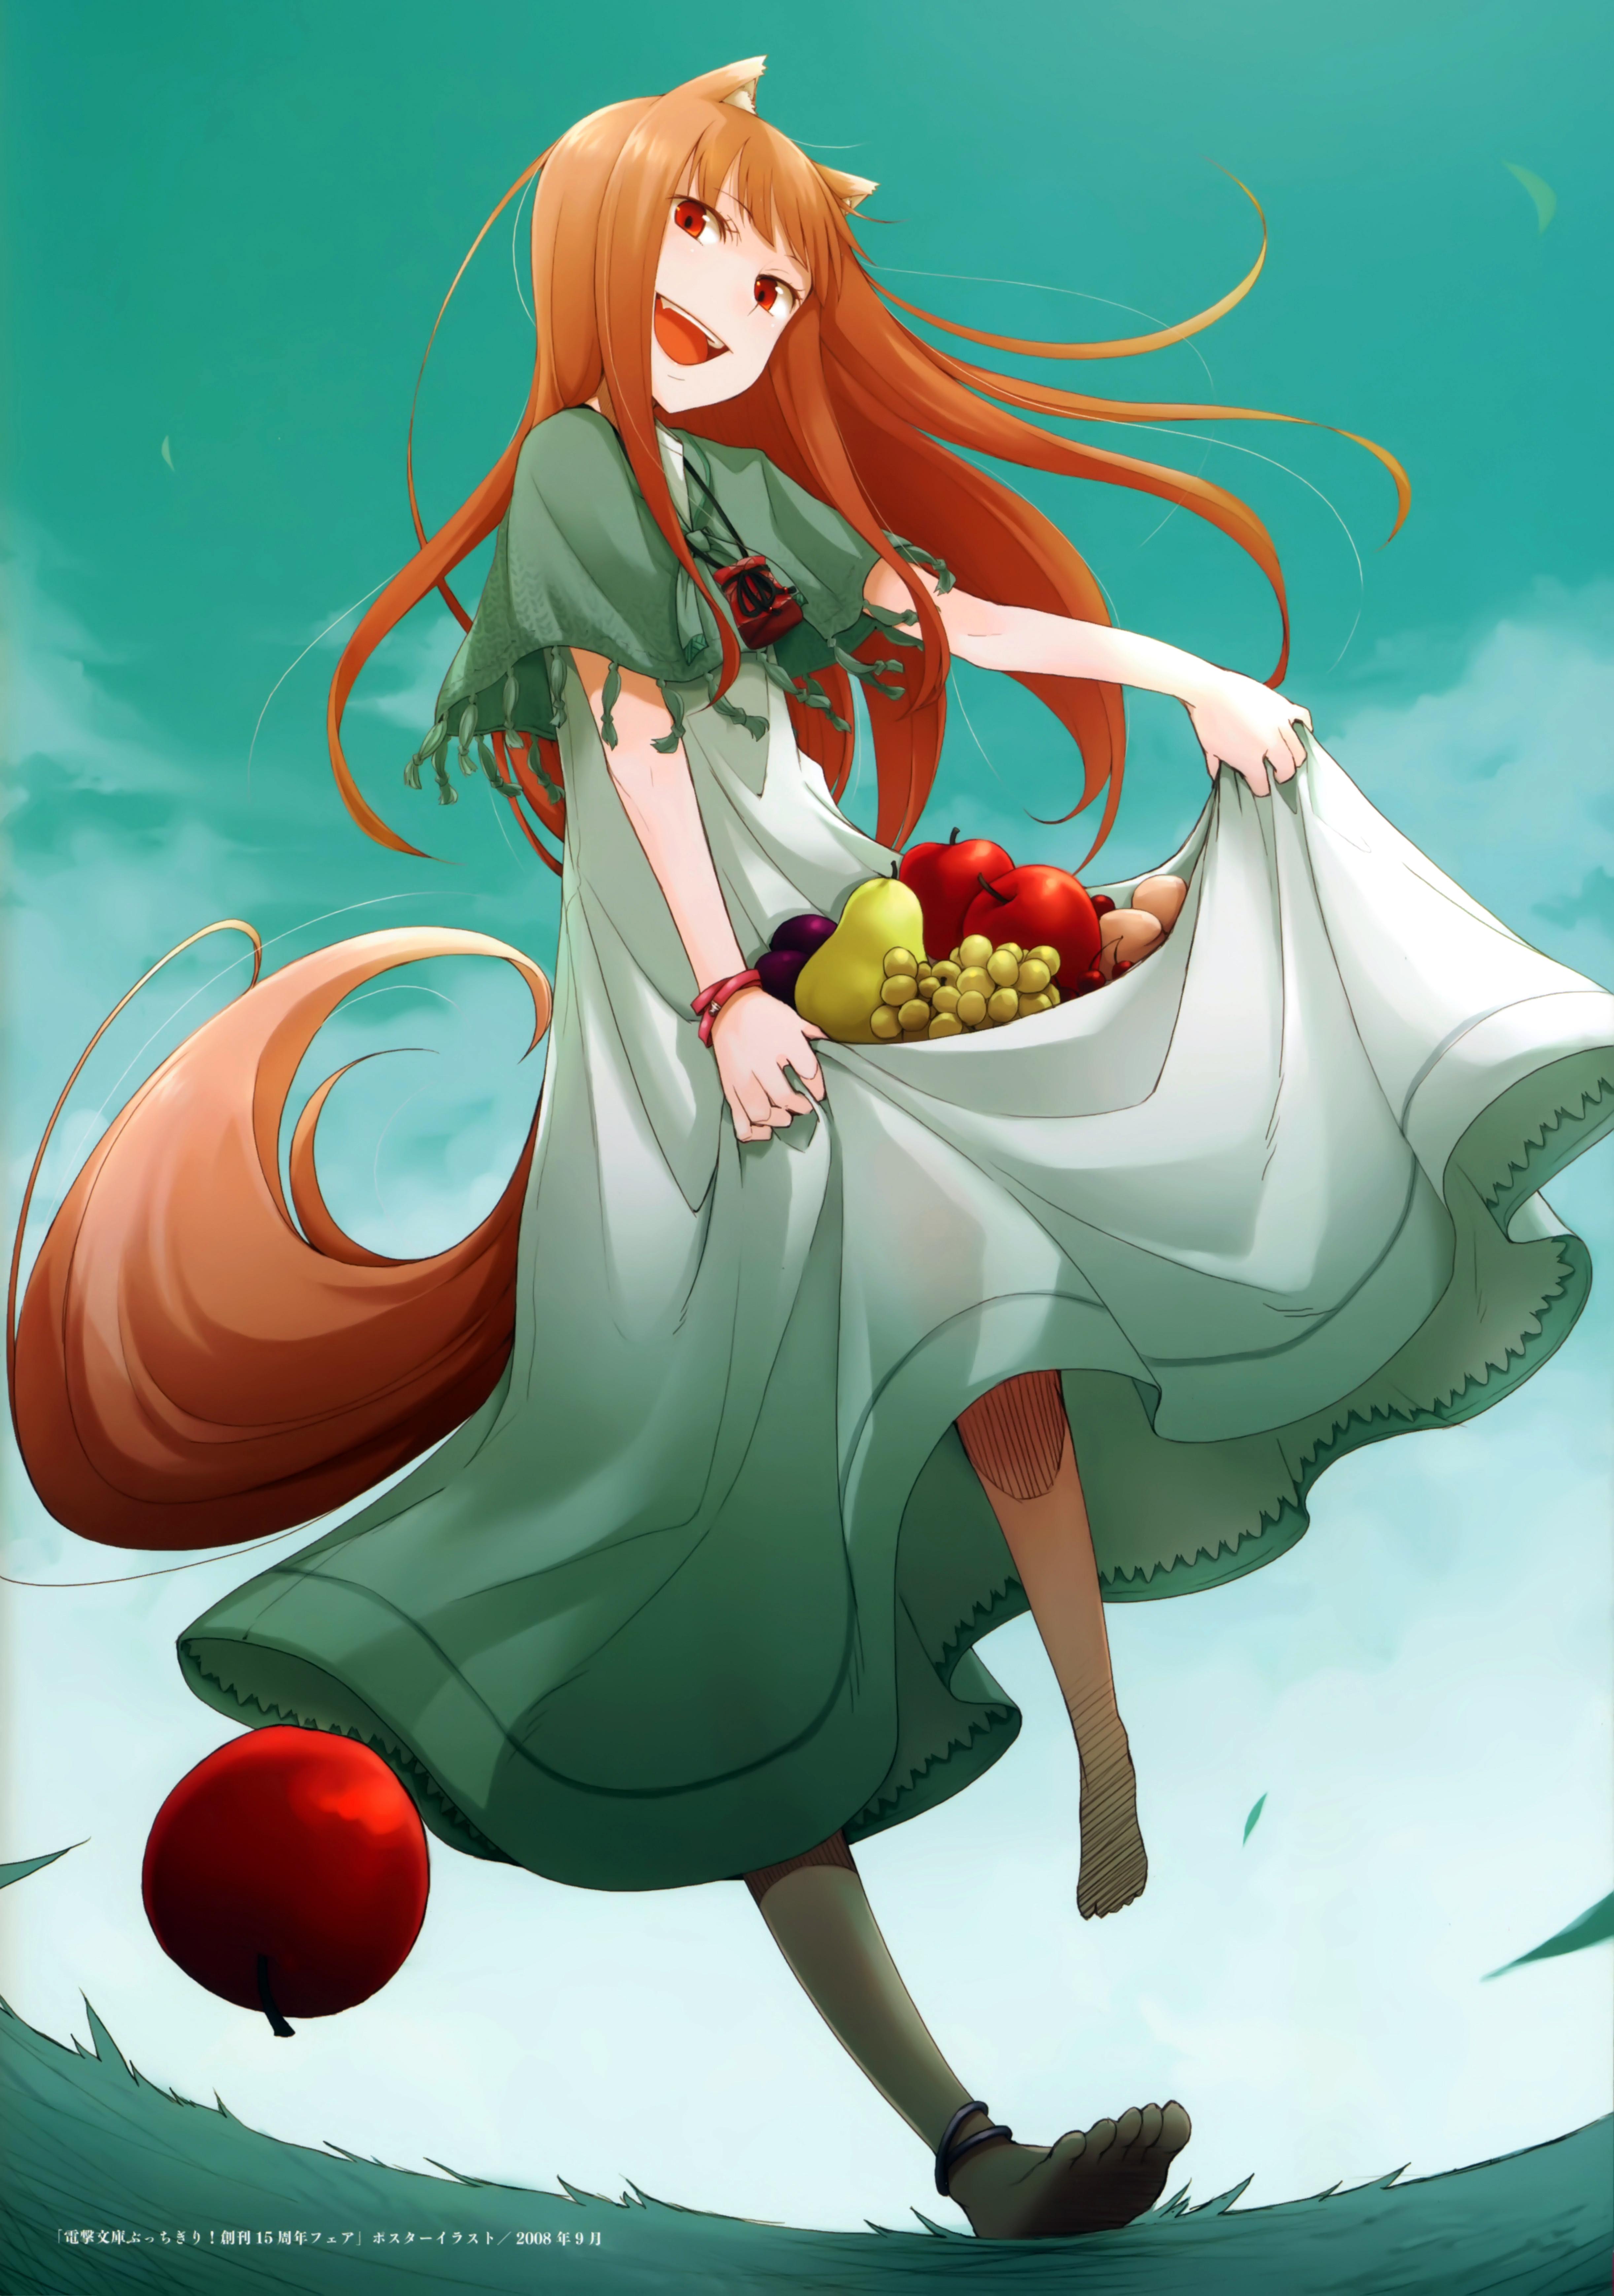 Ookami To Koushinryou Spice And Wolf Mobile Wallpaper Zerochan Anime Image Board